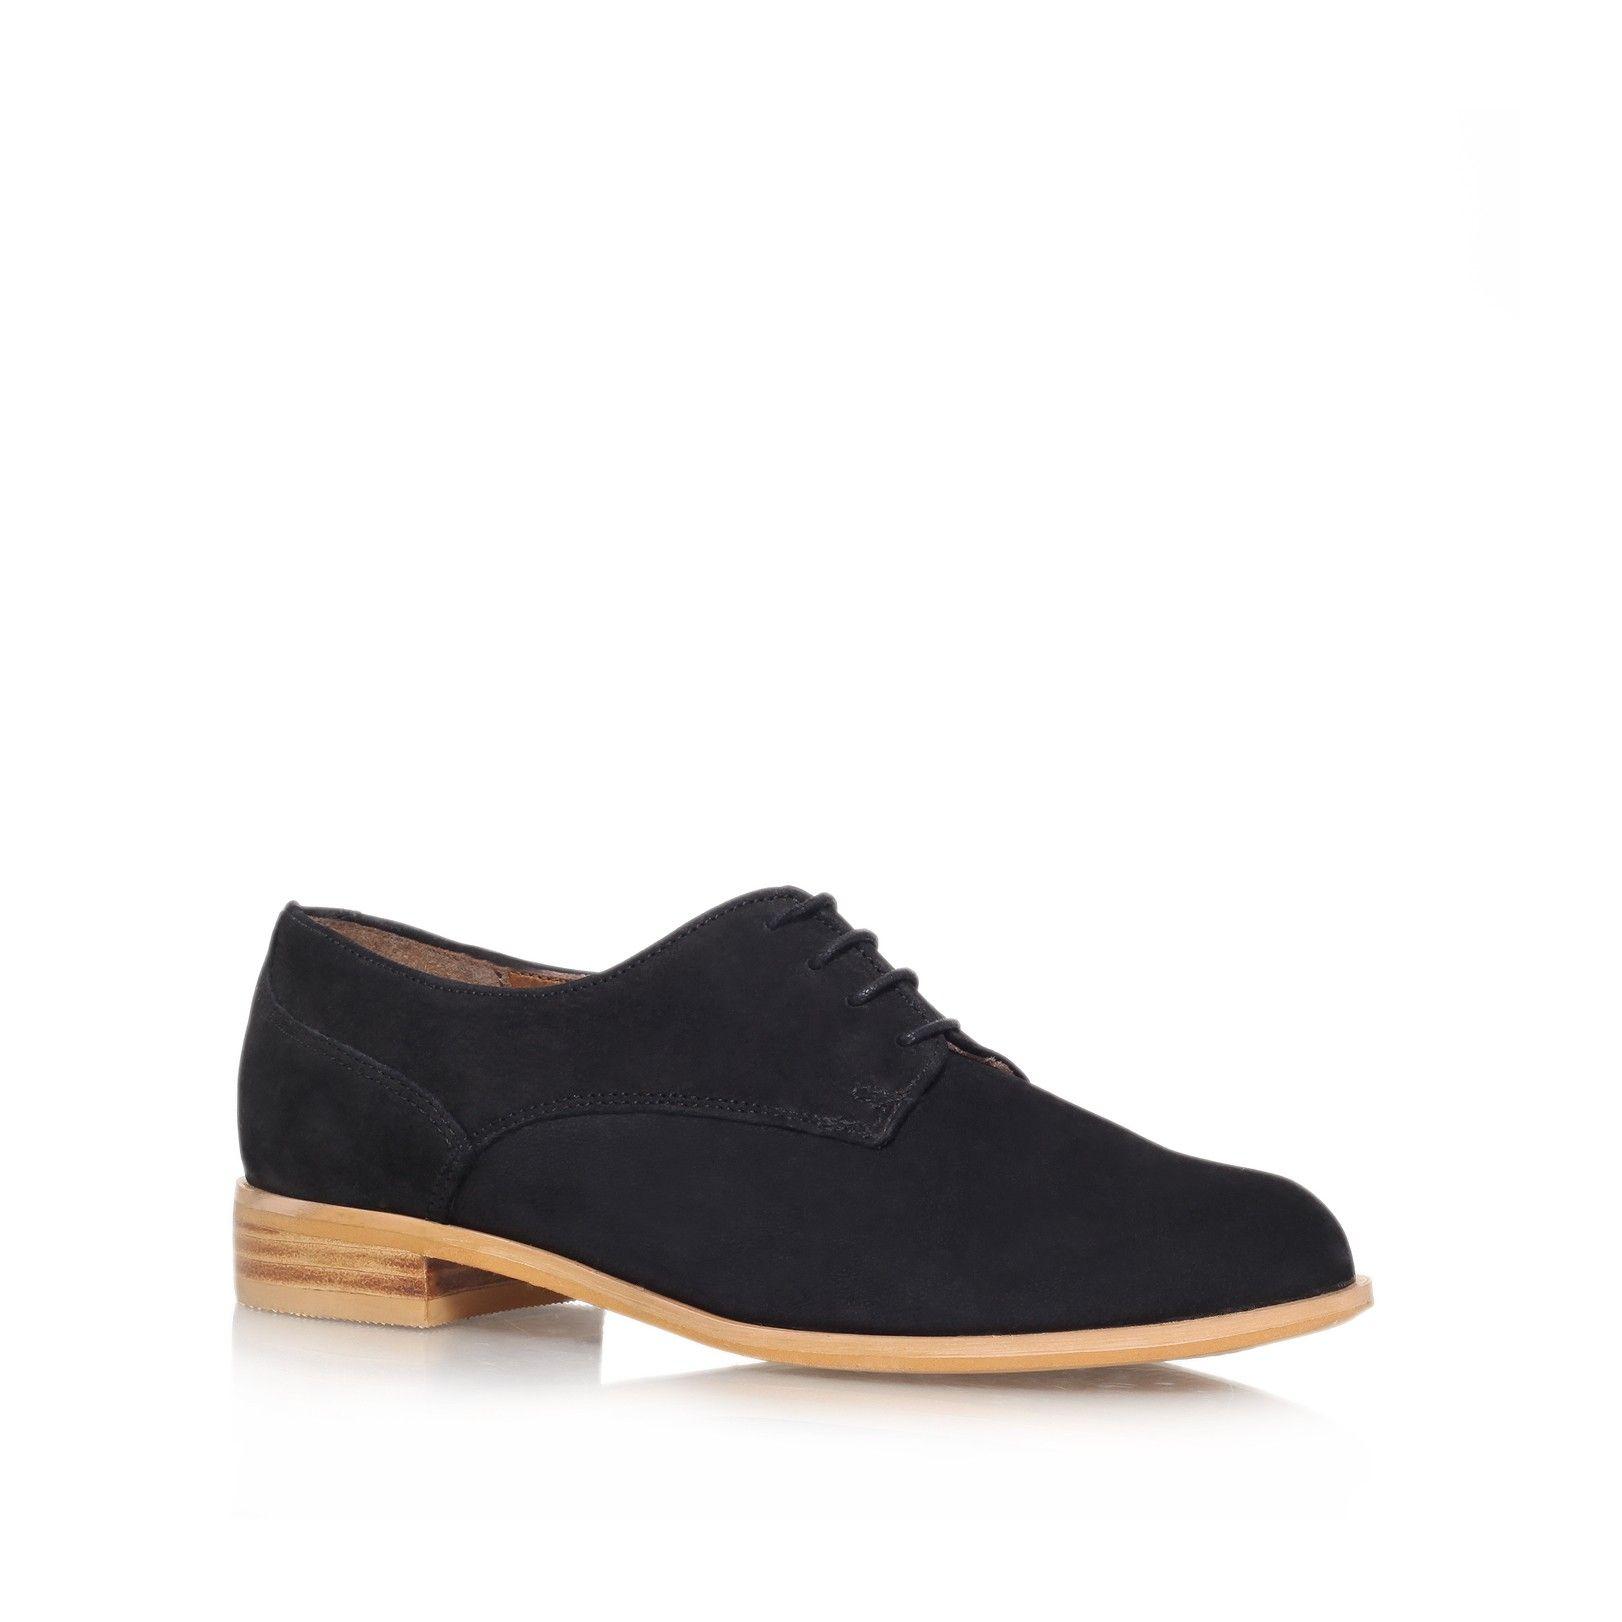 carvela shoes boys. little black lace up shoes from carvela kurt geiger boys r